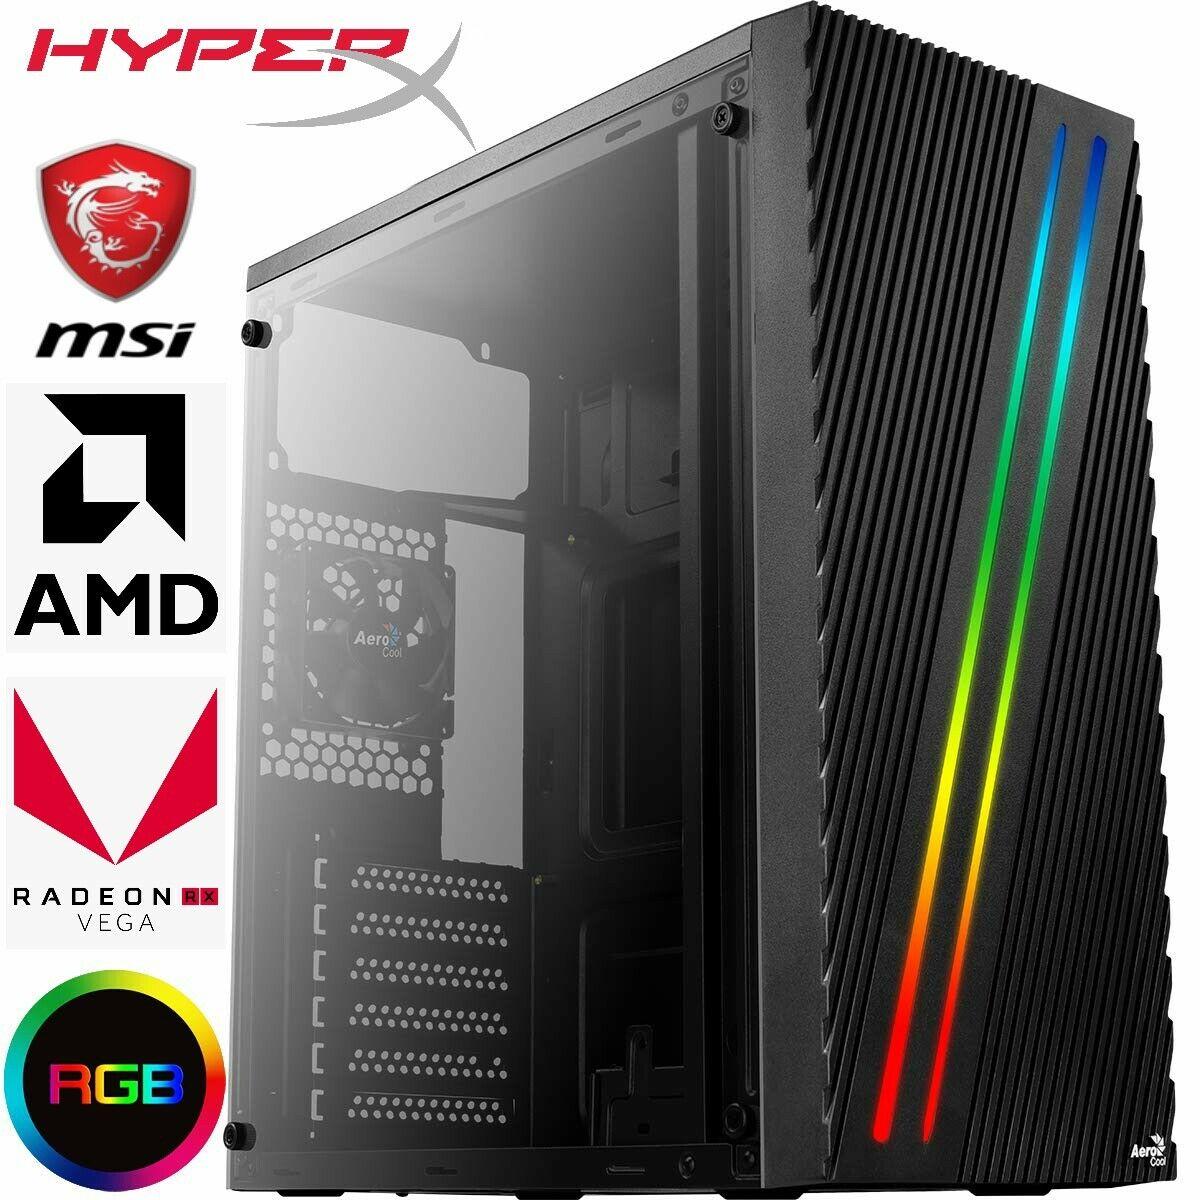 Computer Games - SUPER FAST AMD Gaming PC Computer 8GB RAM 256GB SSD RADEON VEGA 3 WIN 10